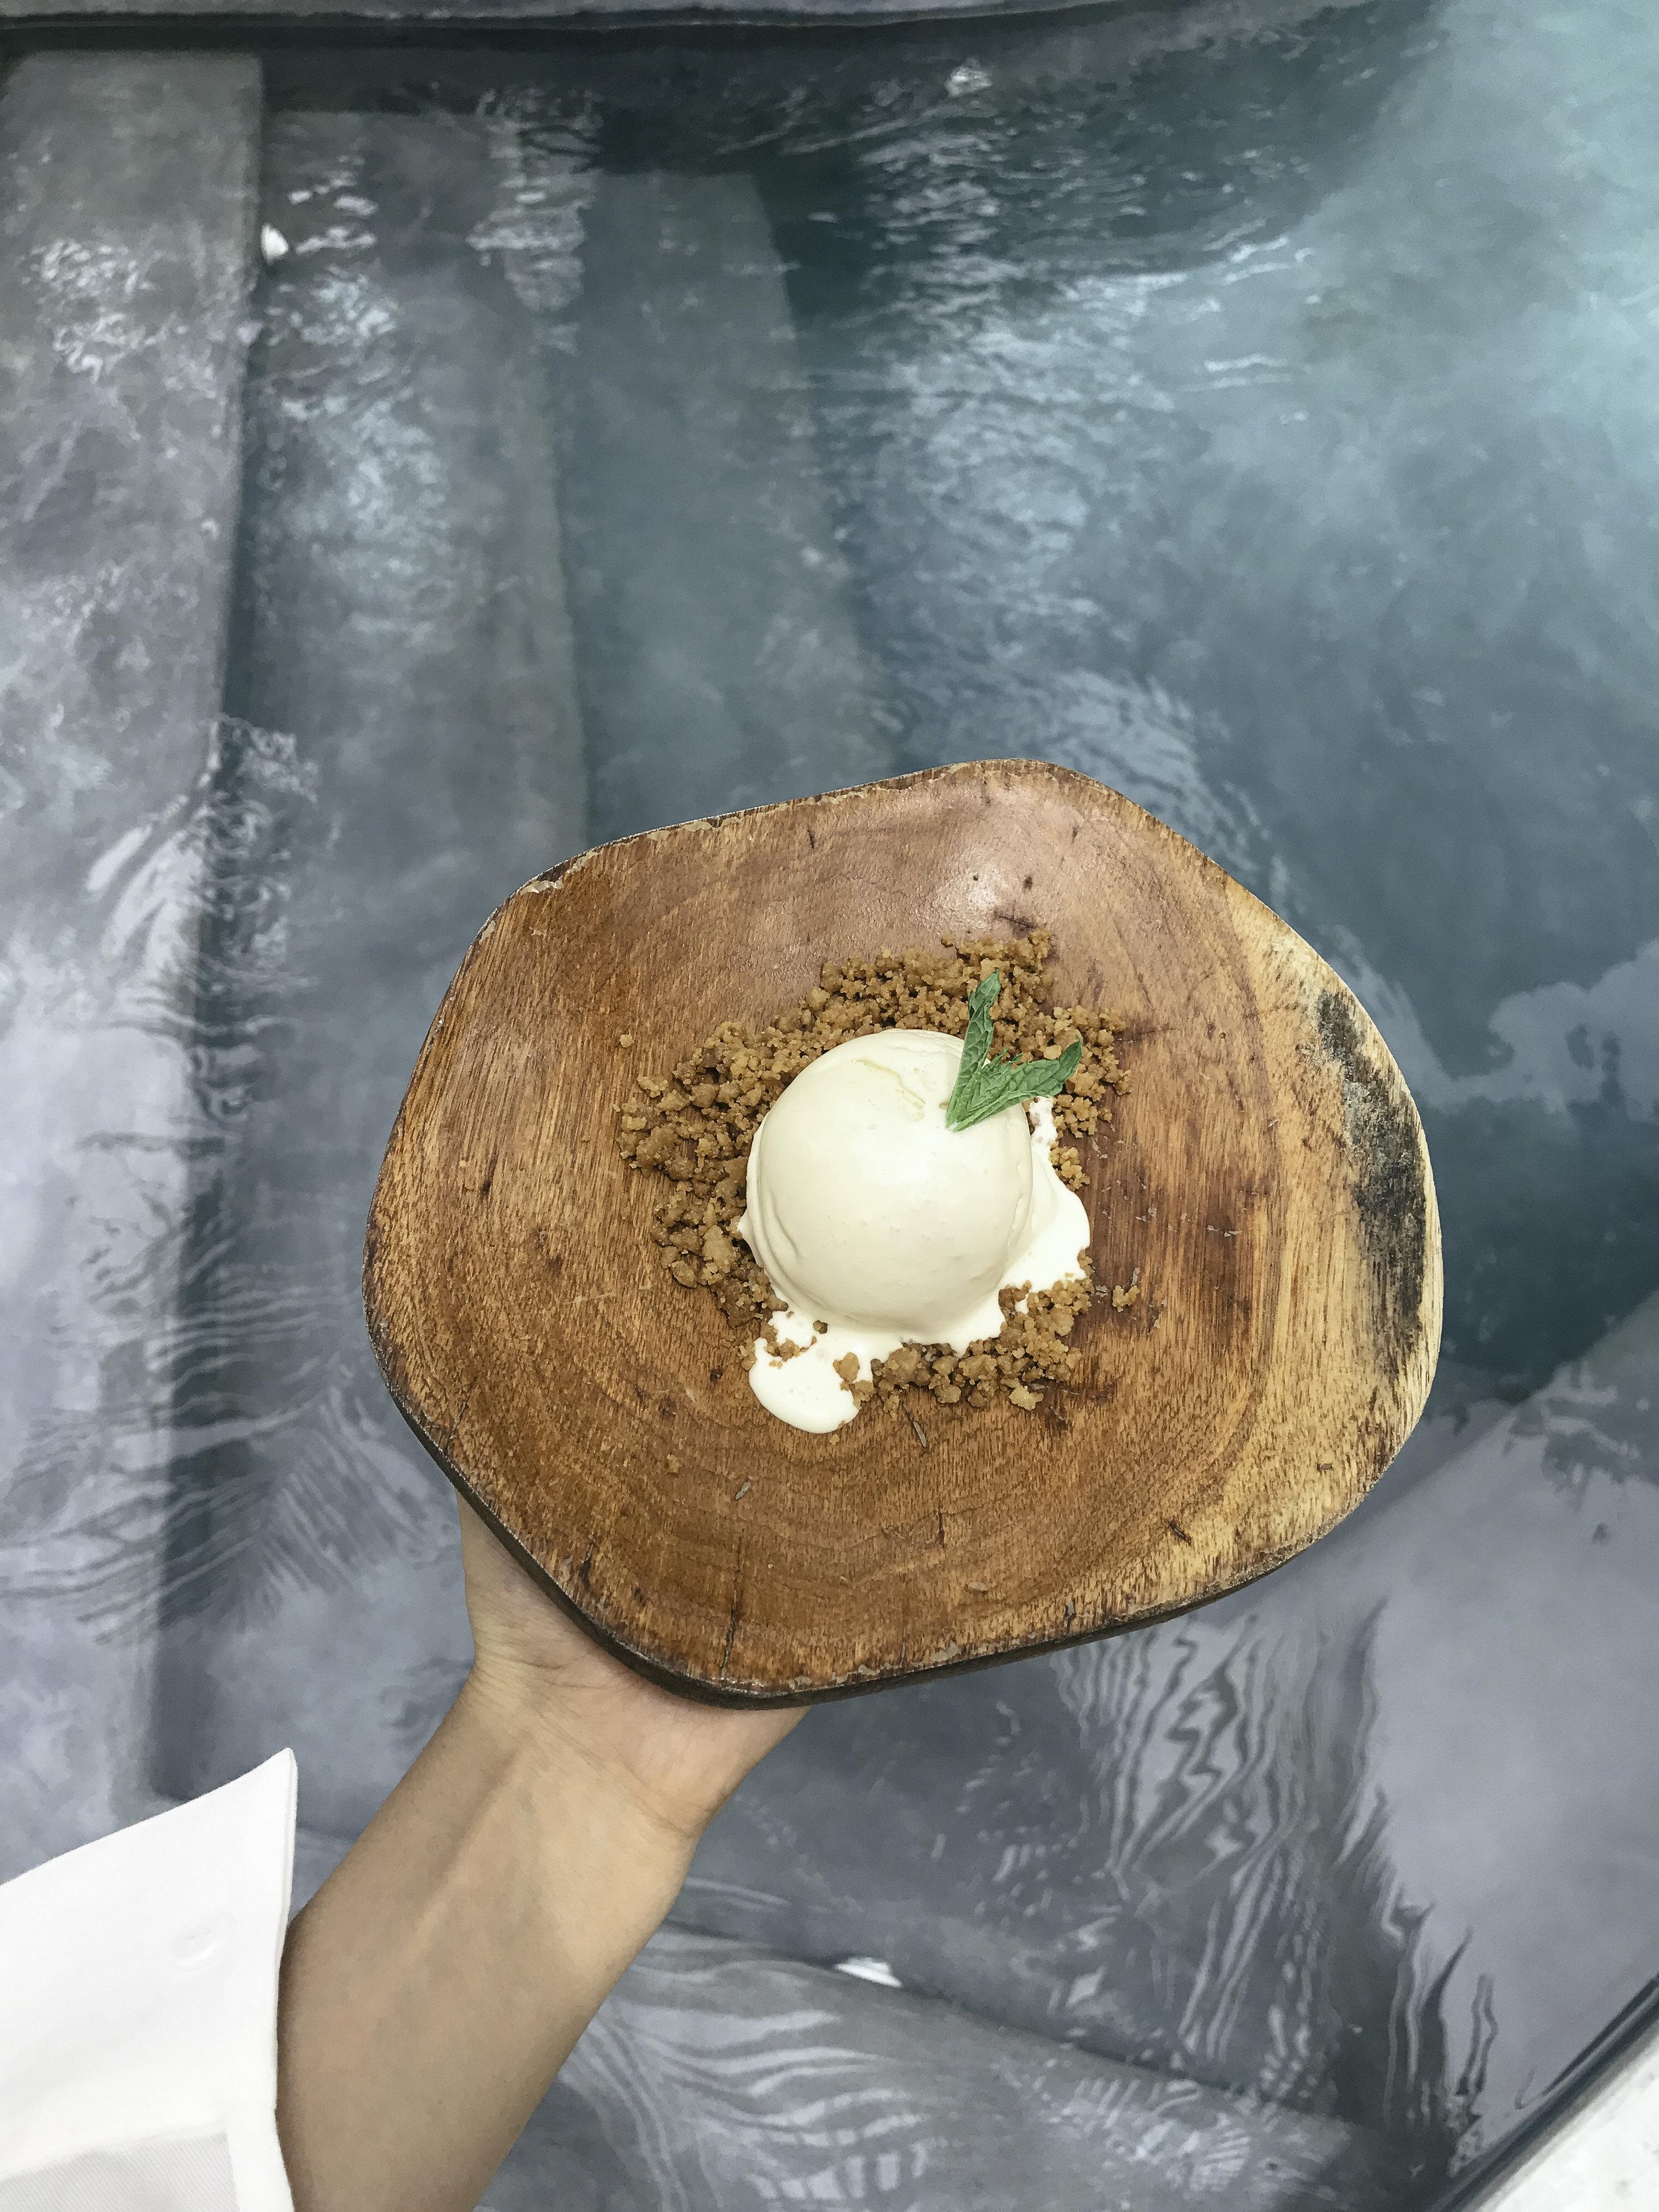 Spiced Dulce de leche ice cream